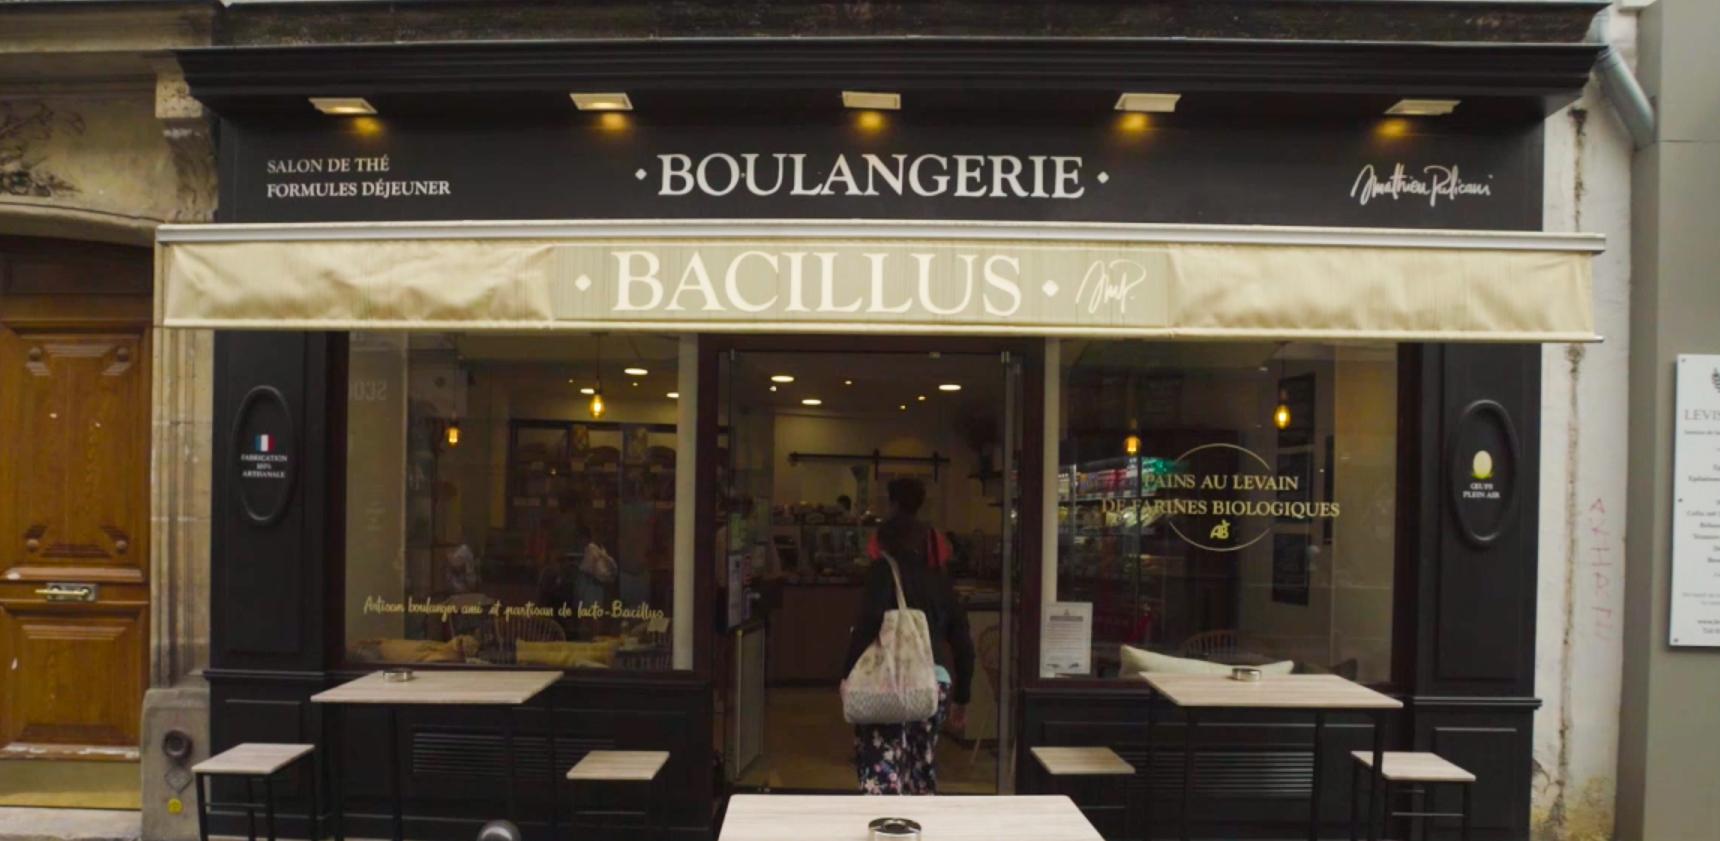 BACILLUS 0